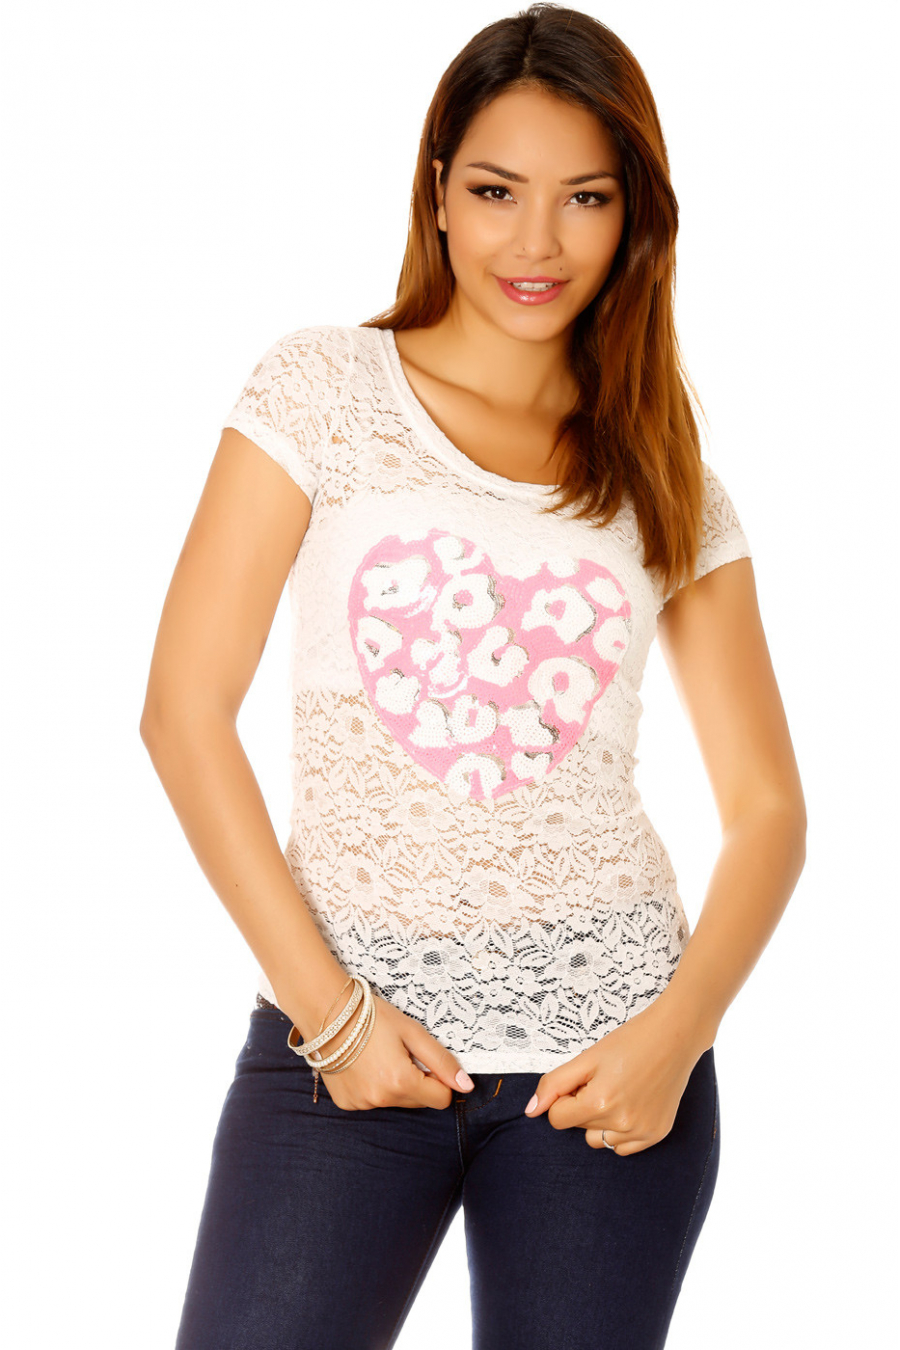 White lace t-shirt with rhinestone heart motif. Women's top 201